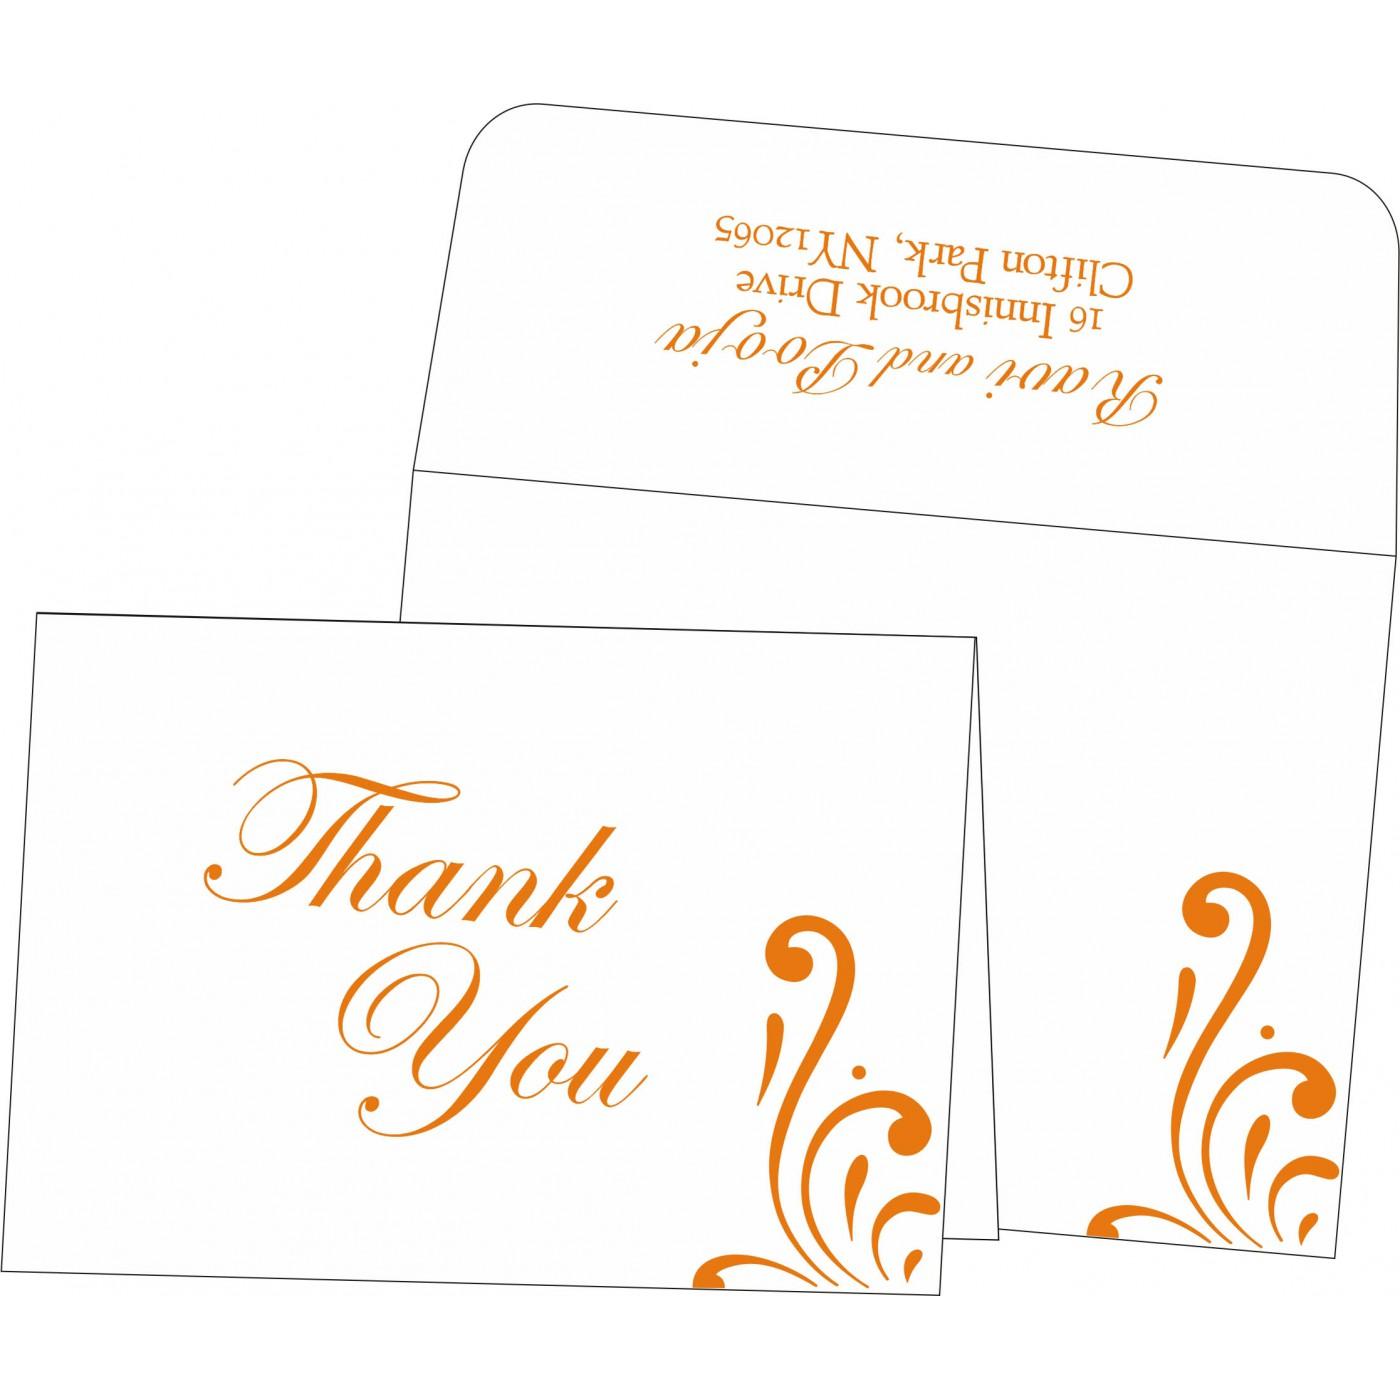 Thank You Cards : CTYC-8223K - IndianWeddingCards